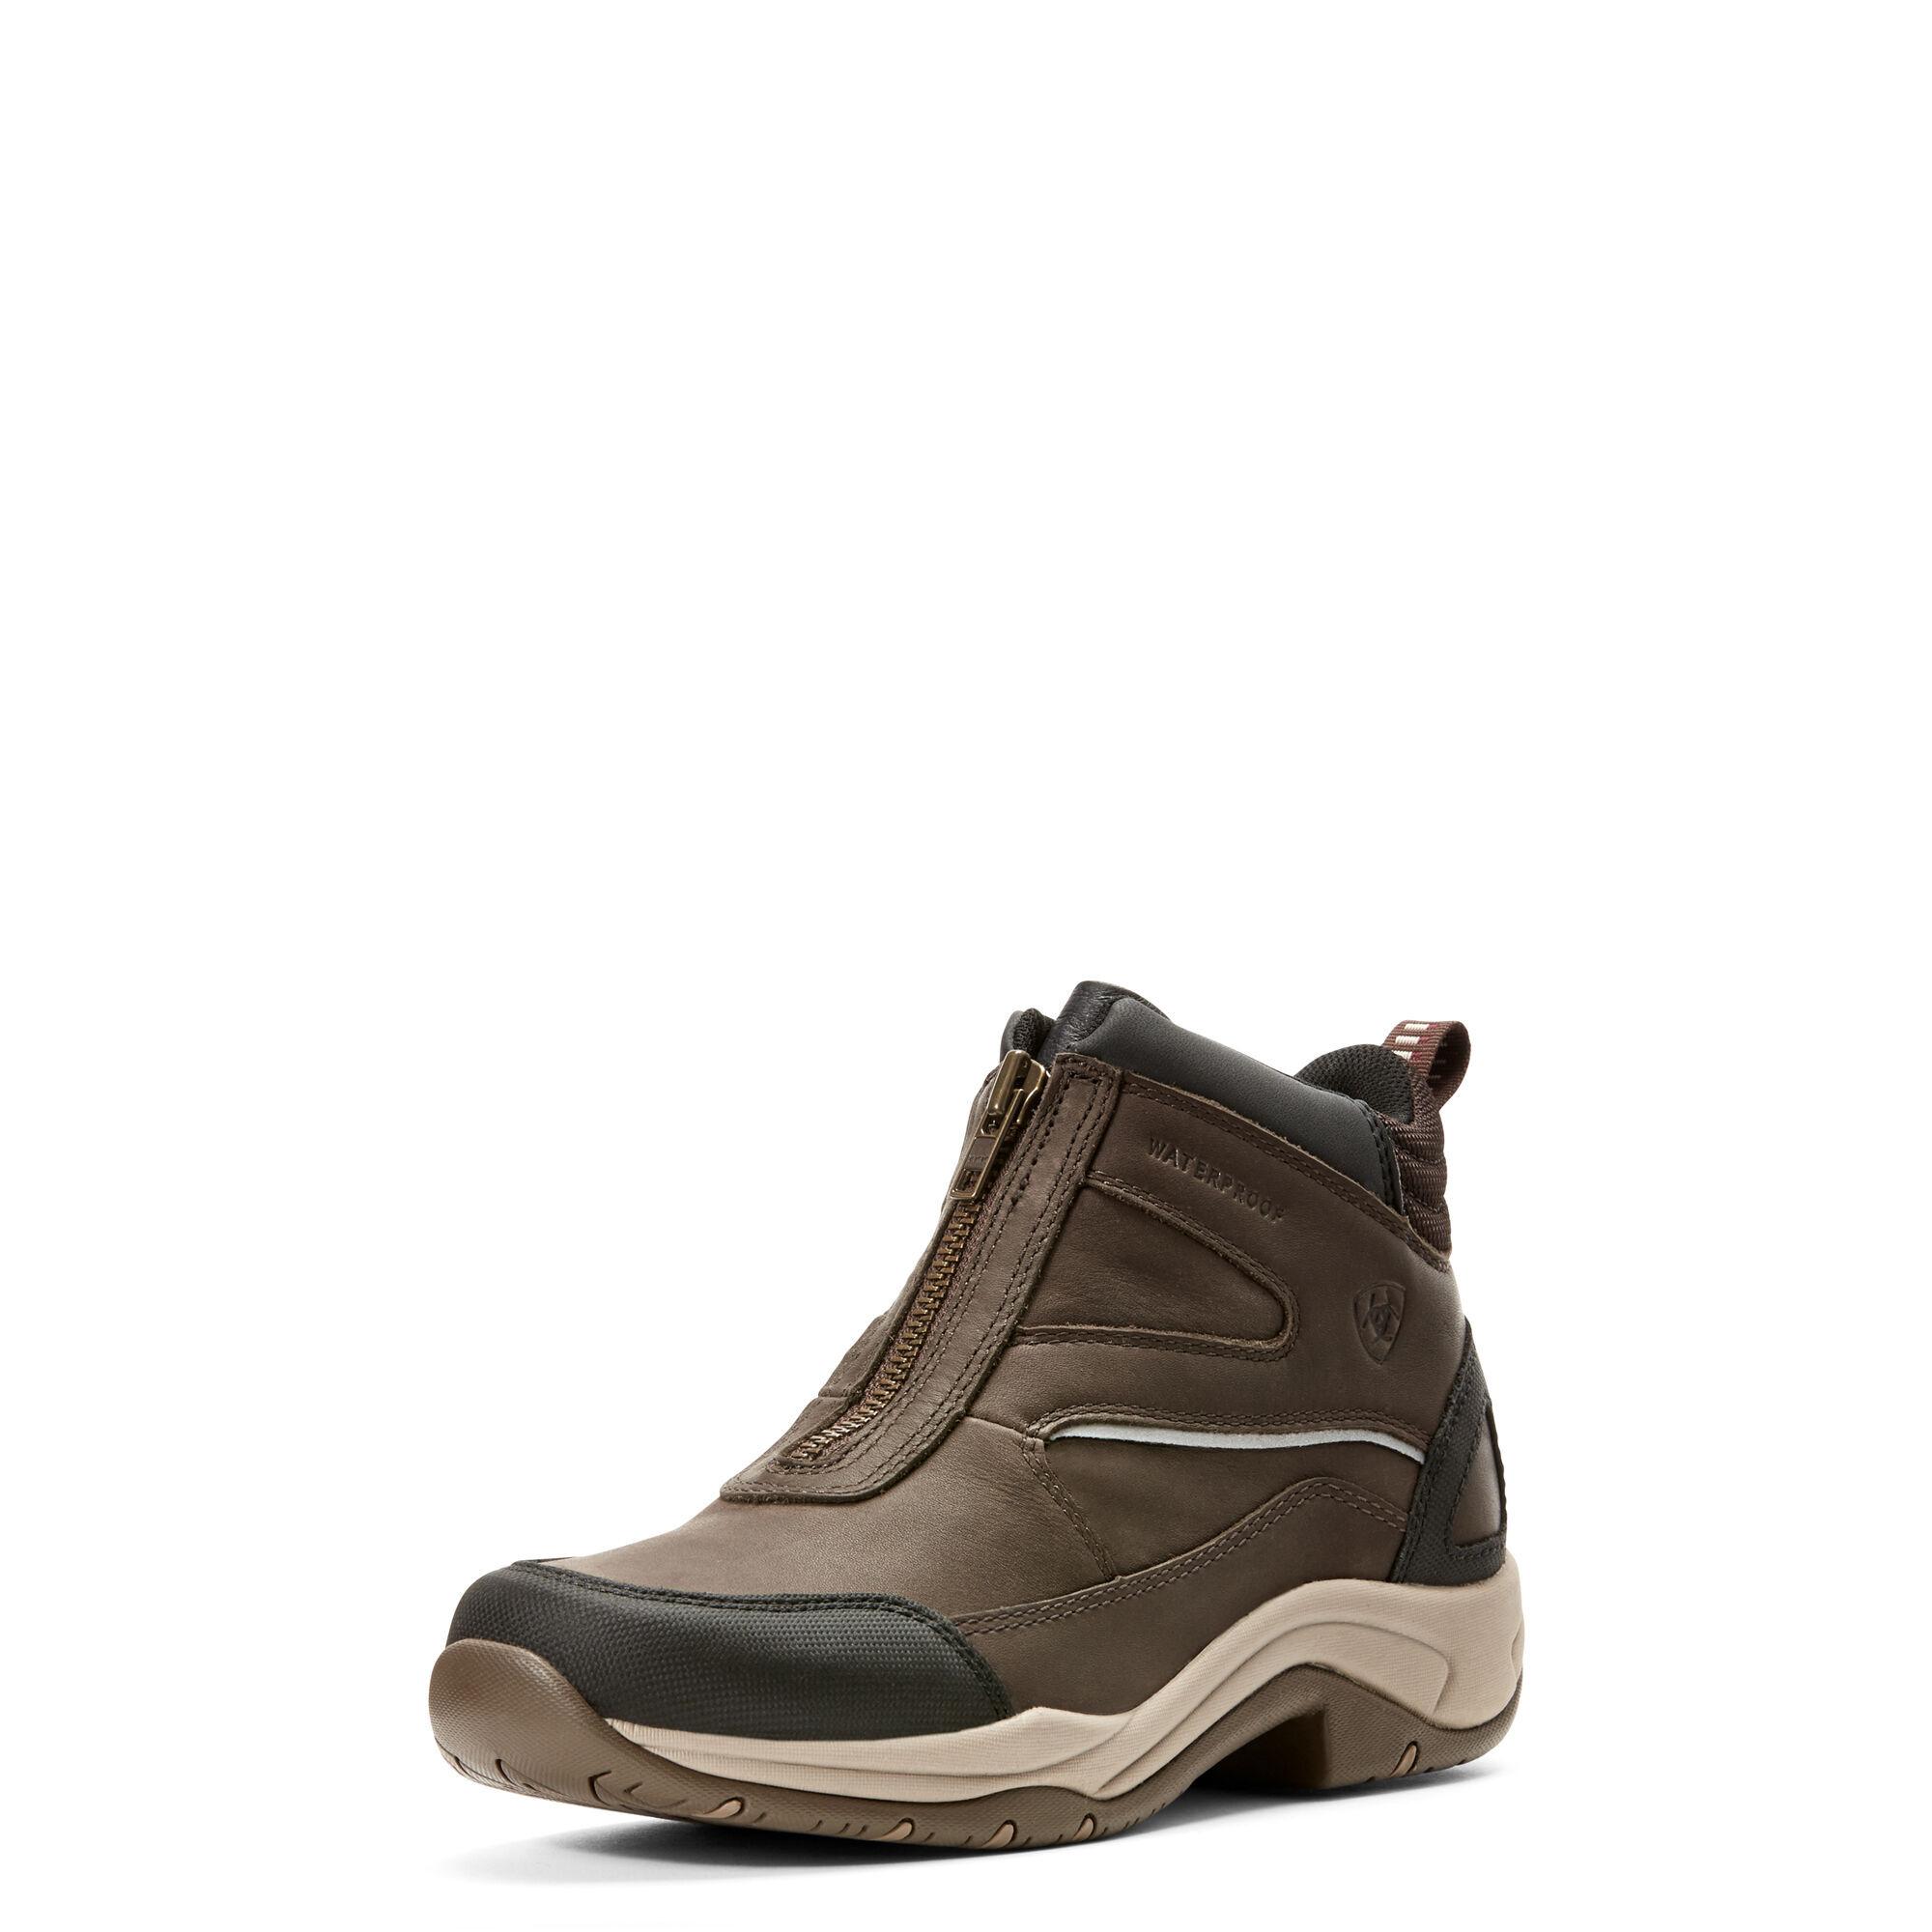 Ariat Women's Telluride Zip Waterproof Shoes in Dark Brown, Size 9 B / Medium by Ariat